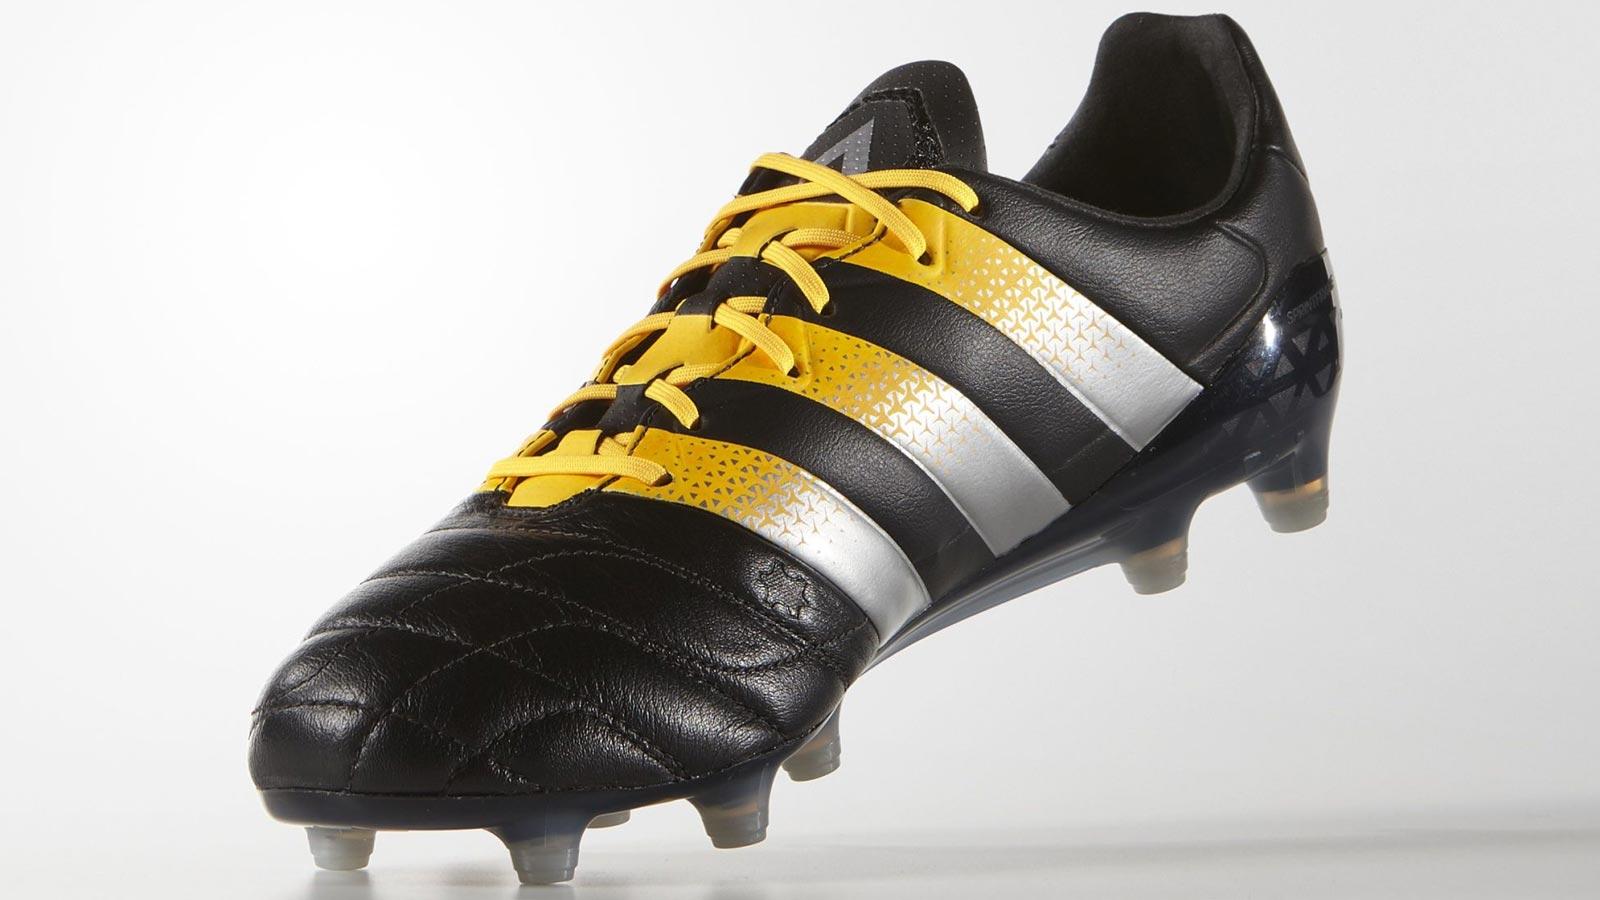 Adidas Ace 16.1 FG Men Leather solar yellow/core black ...